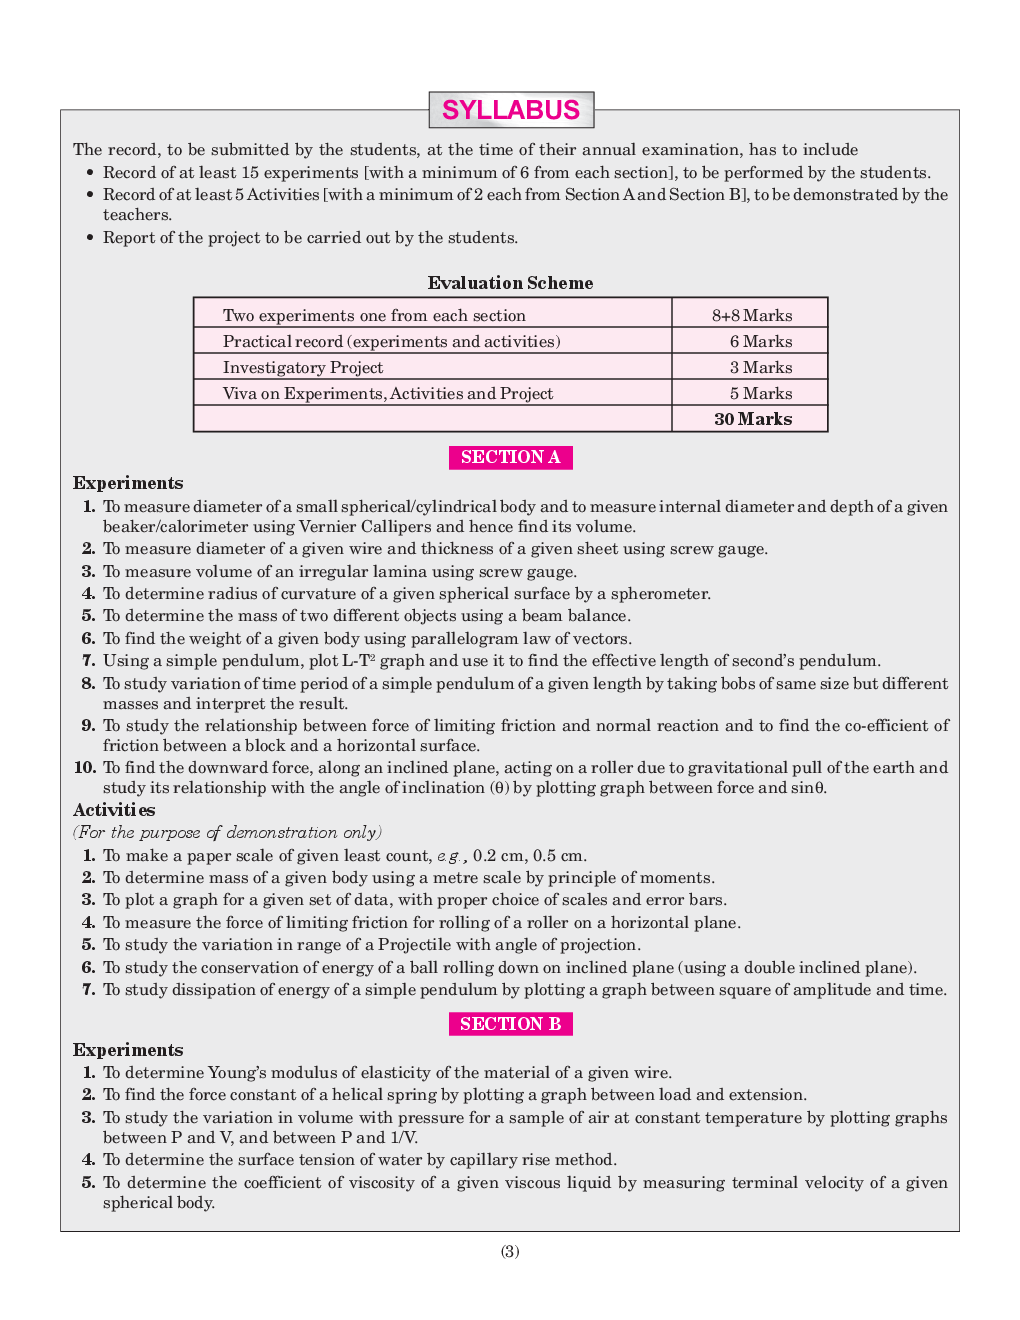 Physics lab manual 11th ebook college physics 11th edition 9781305952300 1305952308 array download saraswati lab manual physics class xi pdf online rh kopykitab com fandeluxe Images